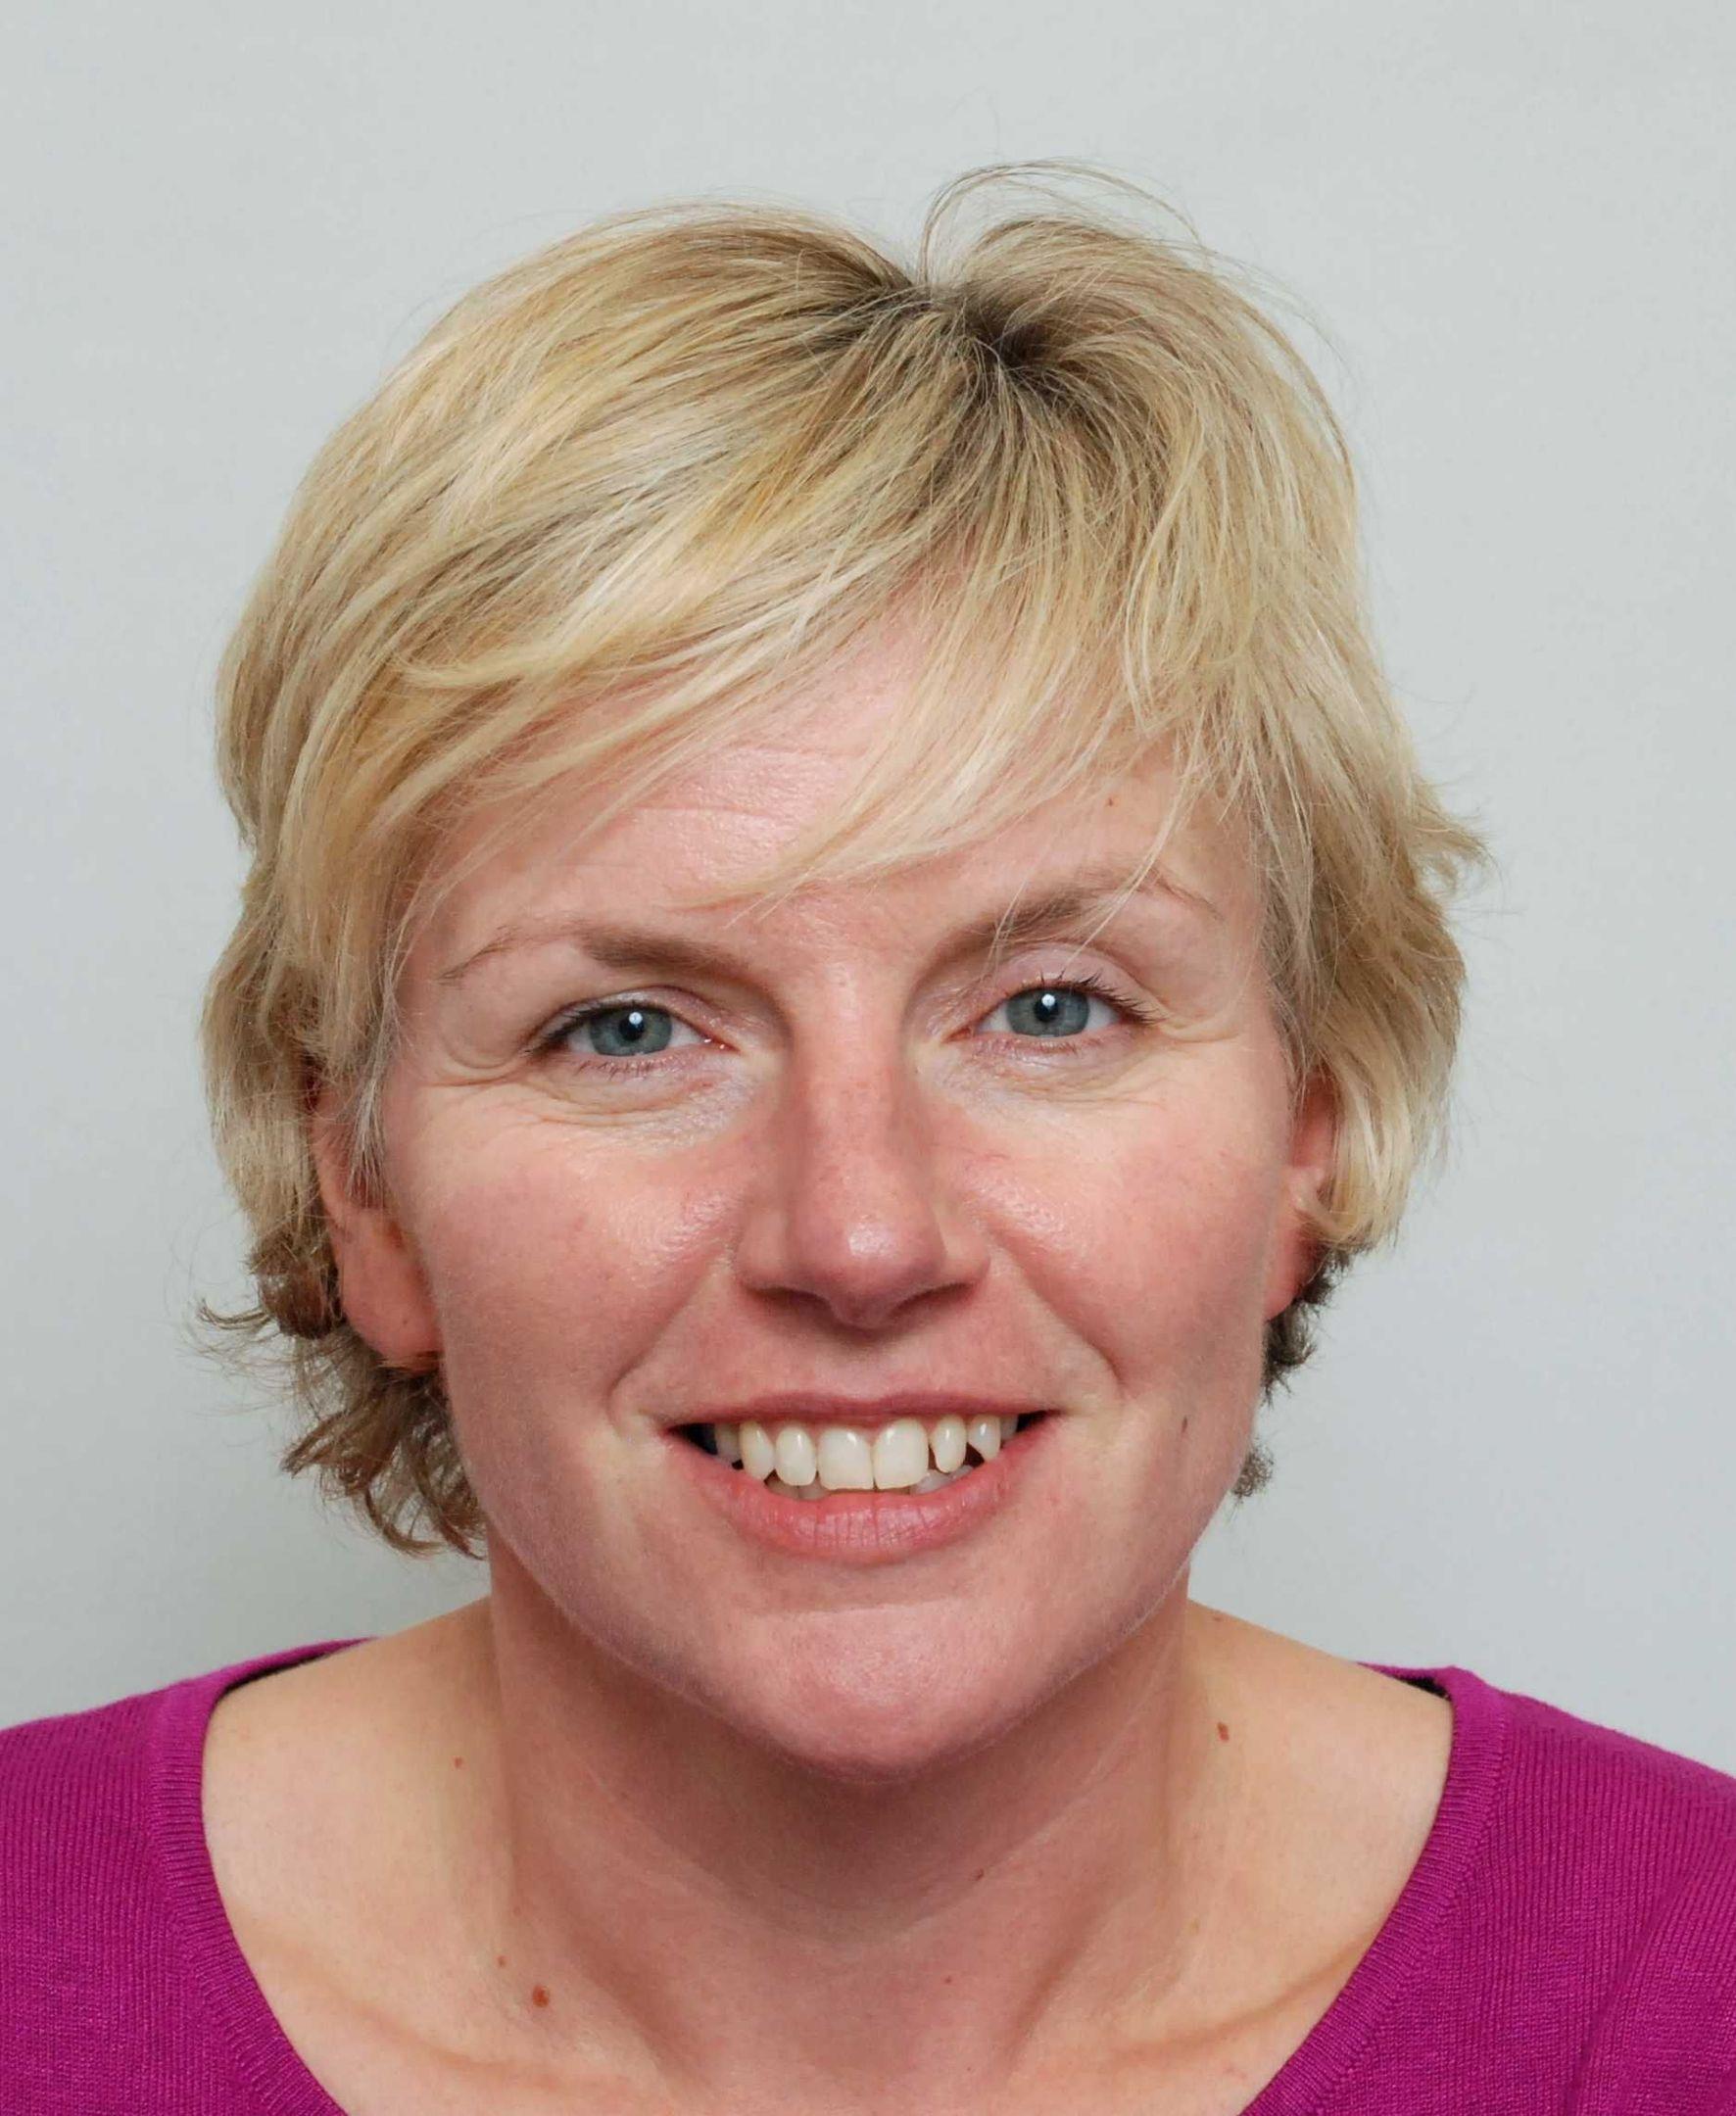 Lizbeth Paul is the new head teacher at Kemnay Academy